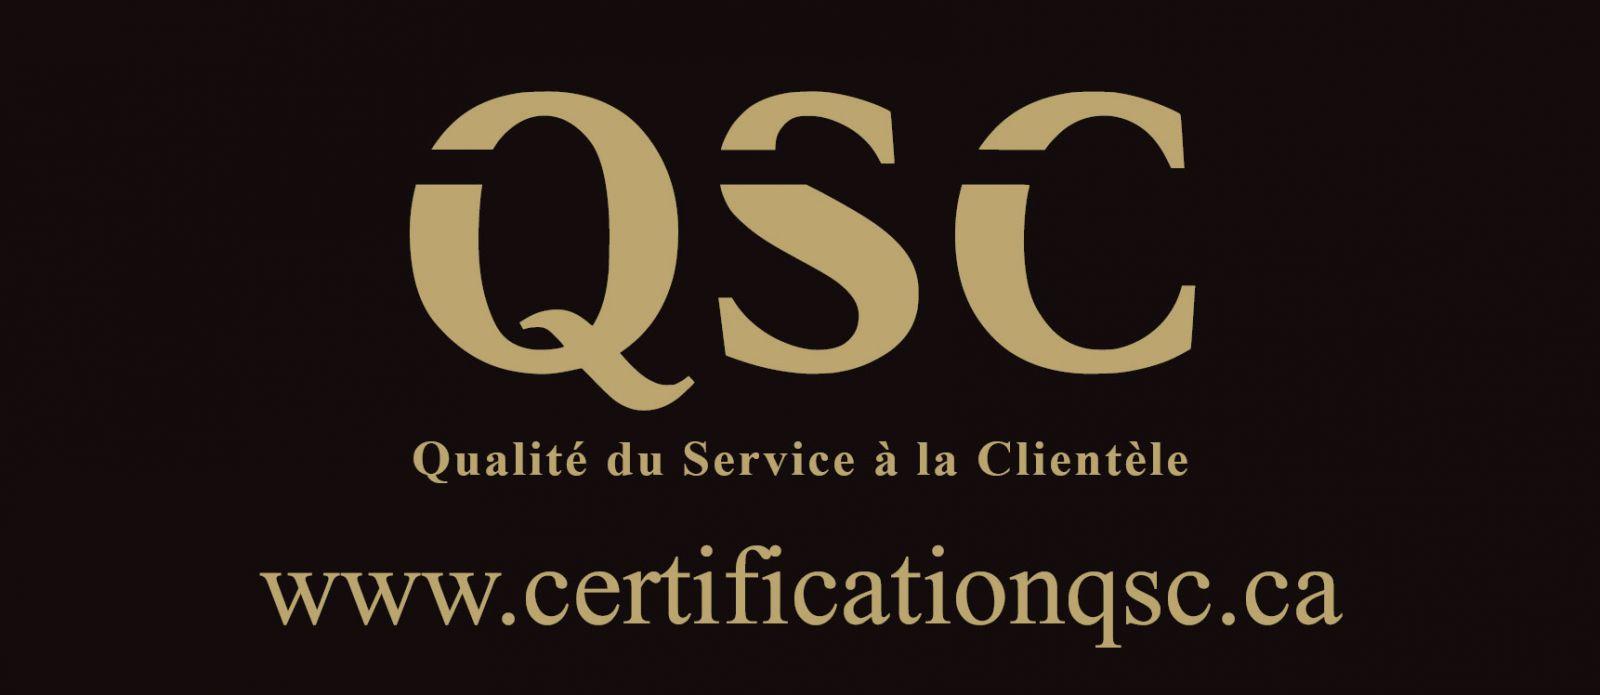 Certification QSC